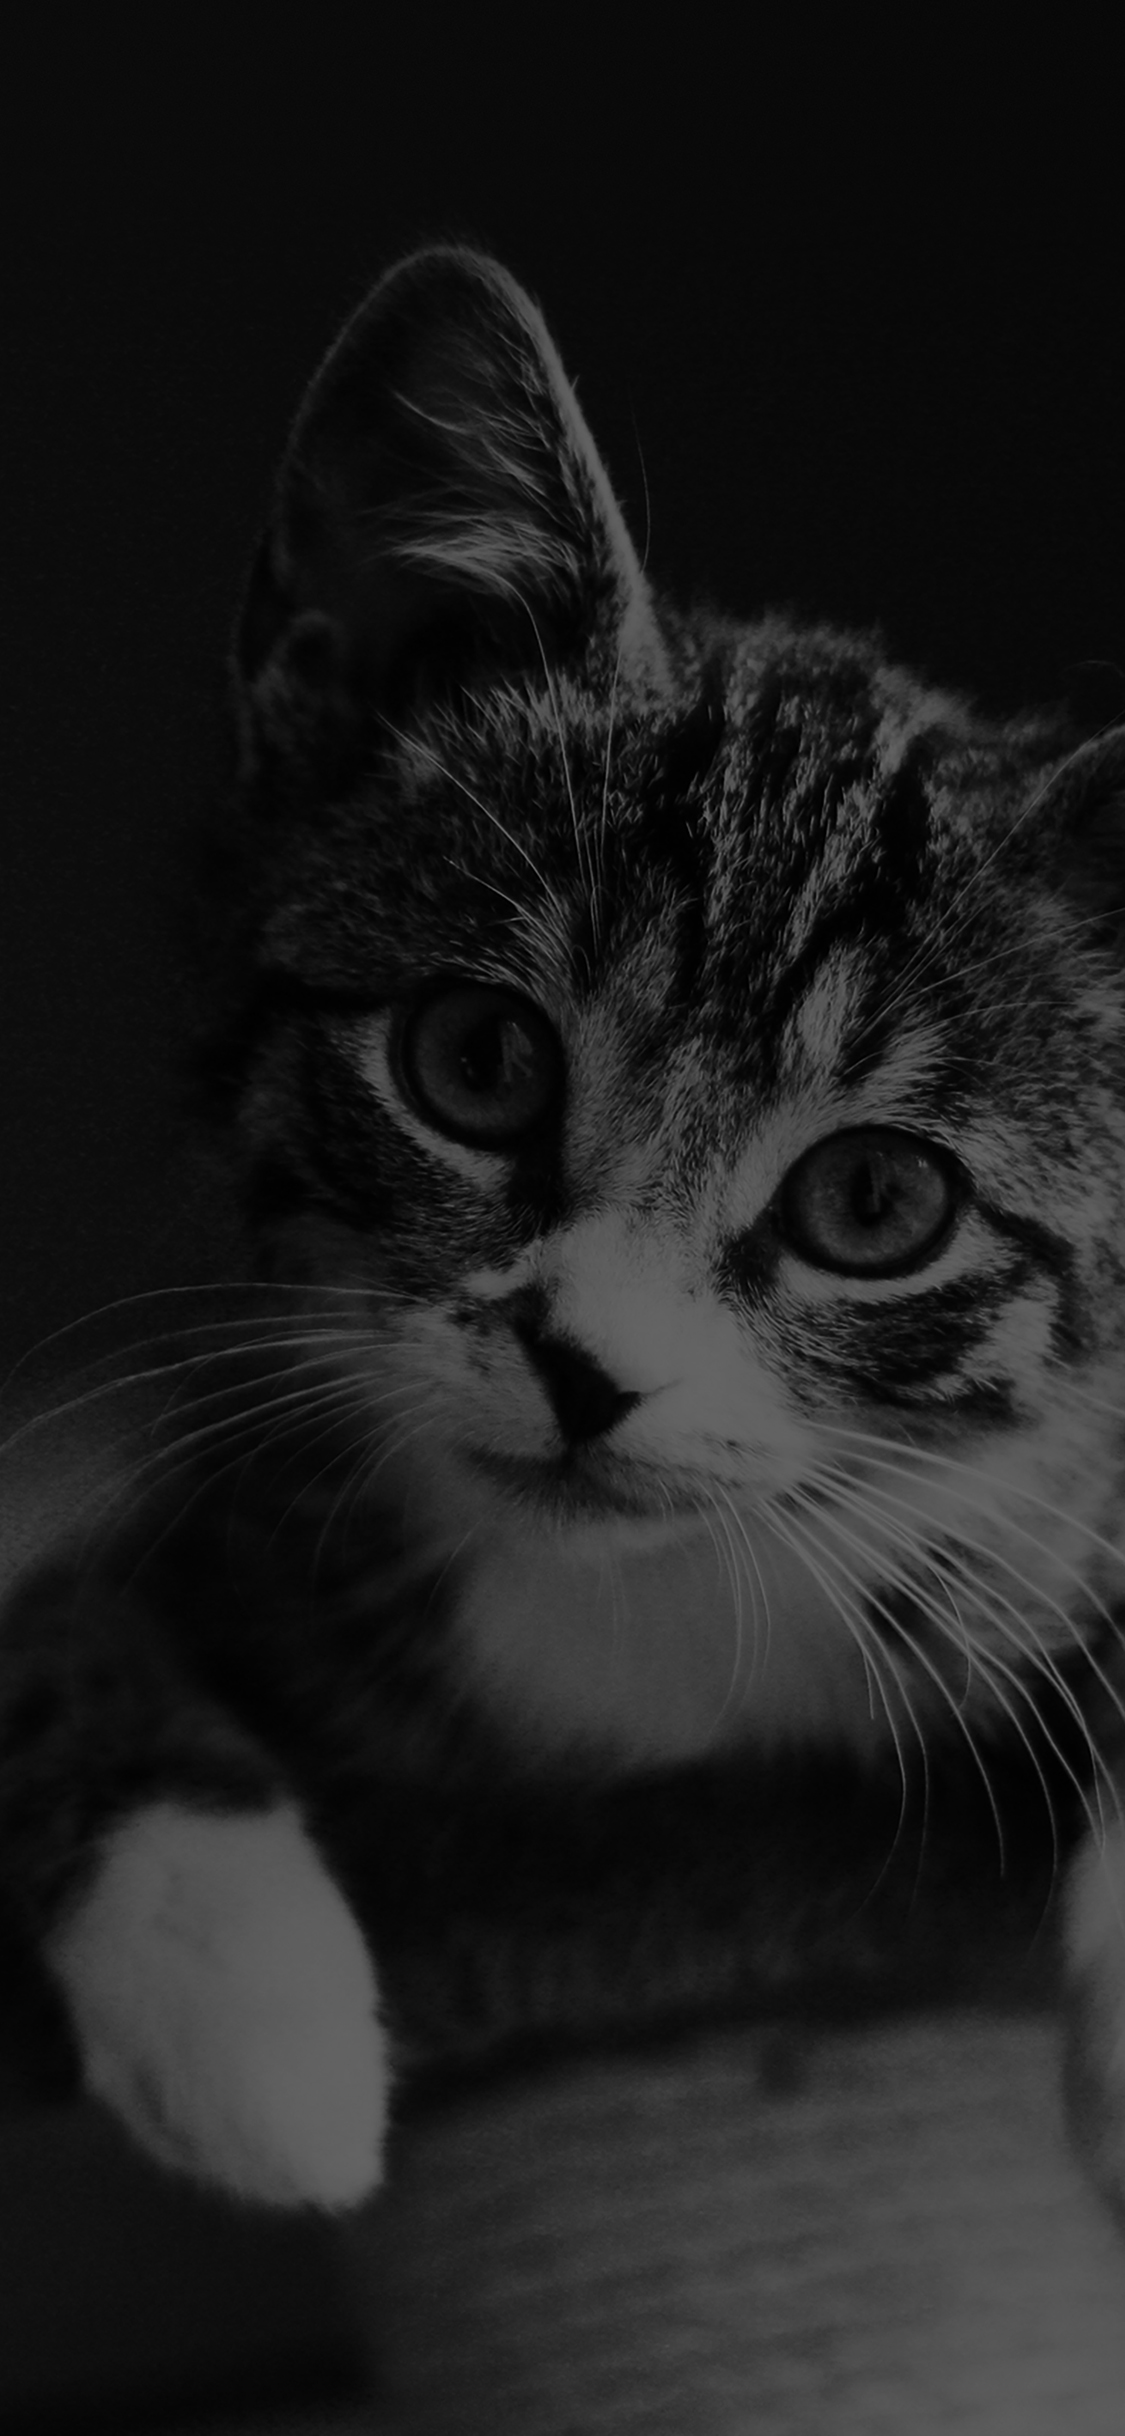 Wallpaper Hd Nexus Mi36 Cute Cat Look Dark Bw Animal Love Nature Wallpaper